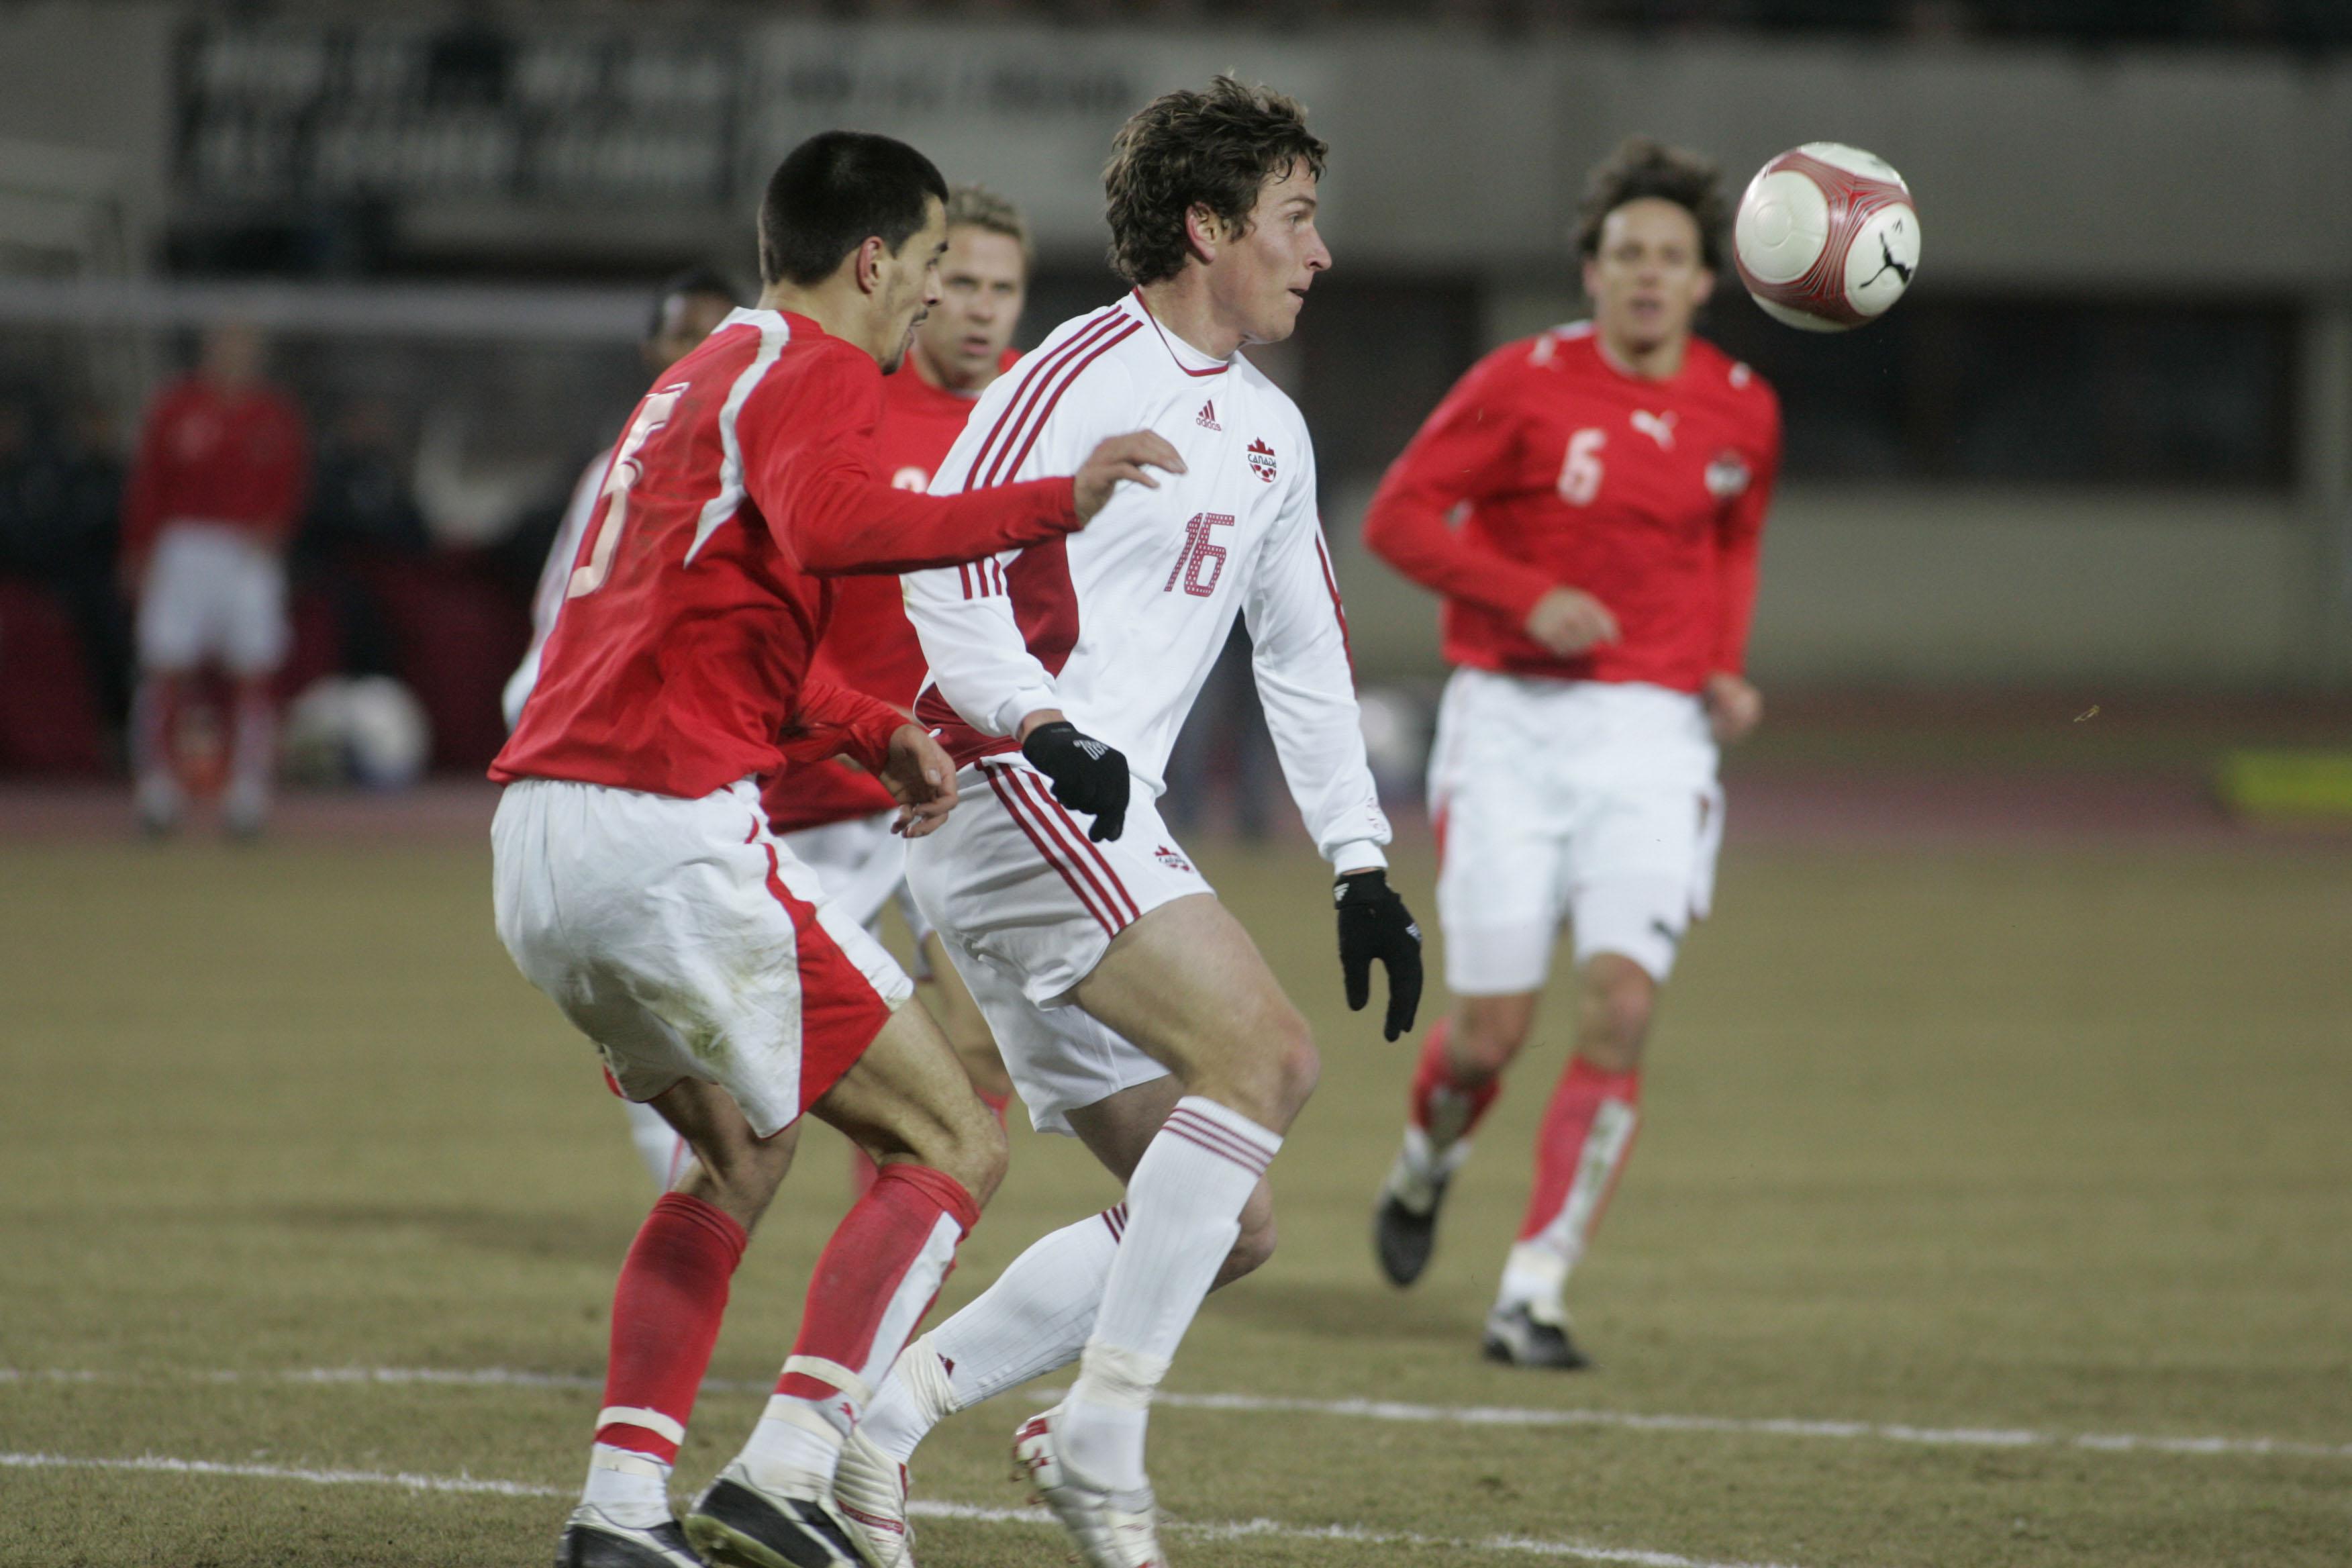 Rob Friend in action for Canada in a 2006 friendly vs. Austria. (Canada Soccer photo)